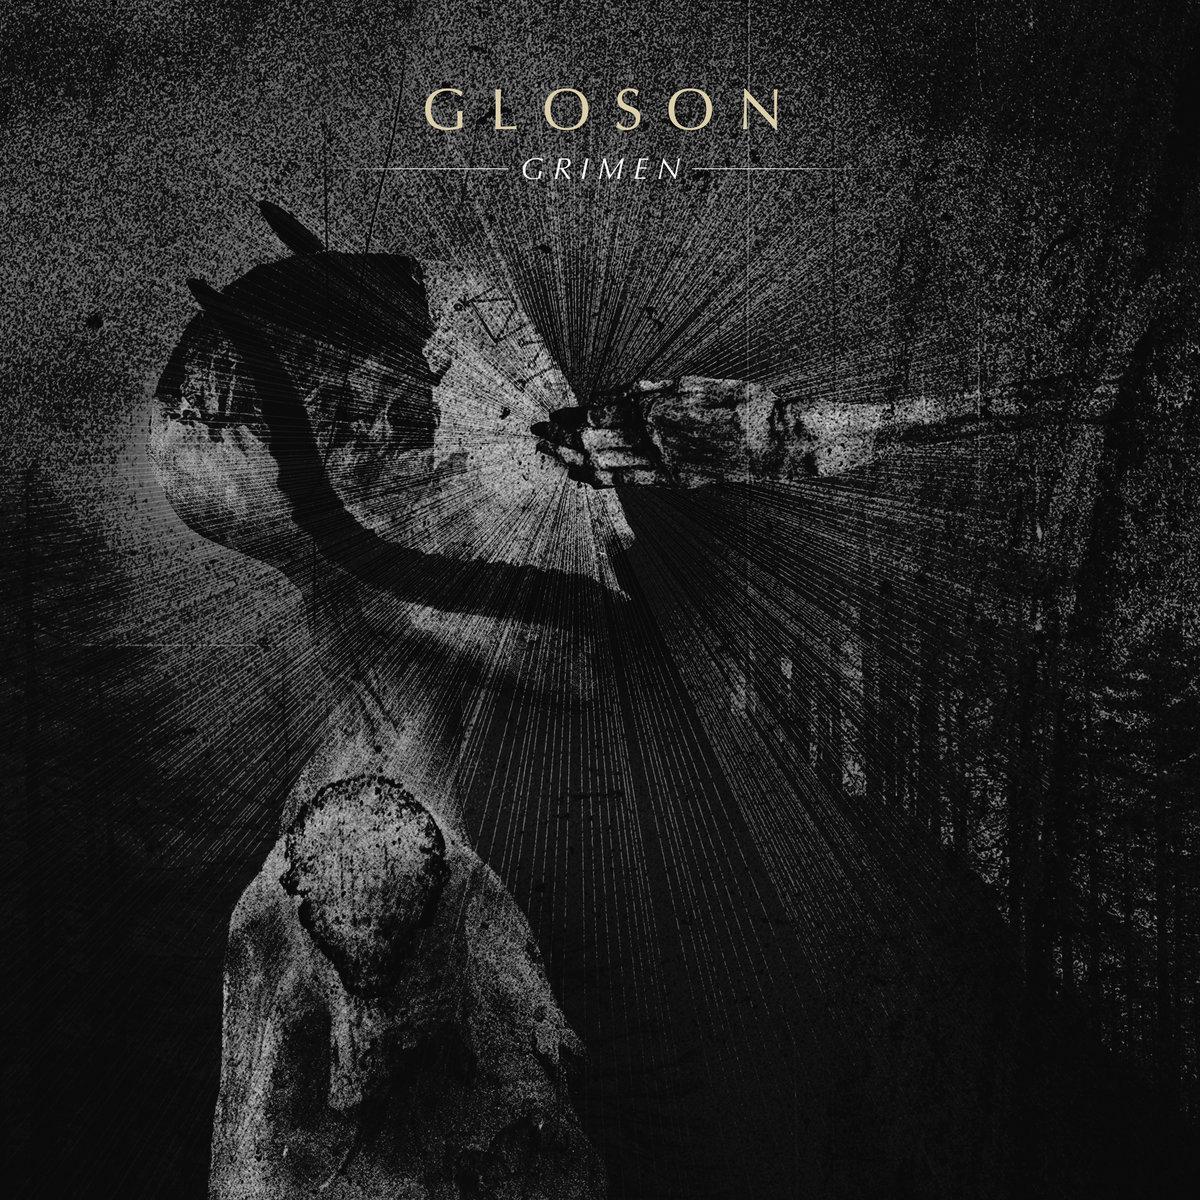 Gloson